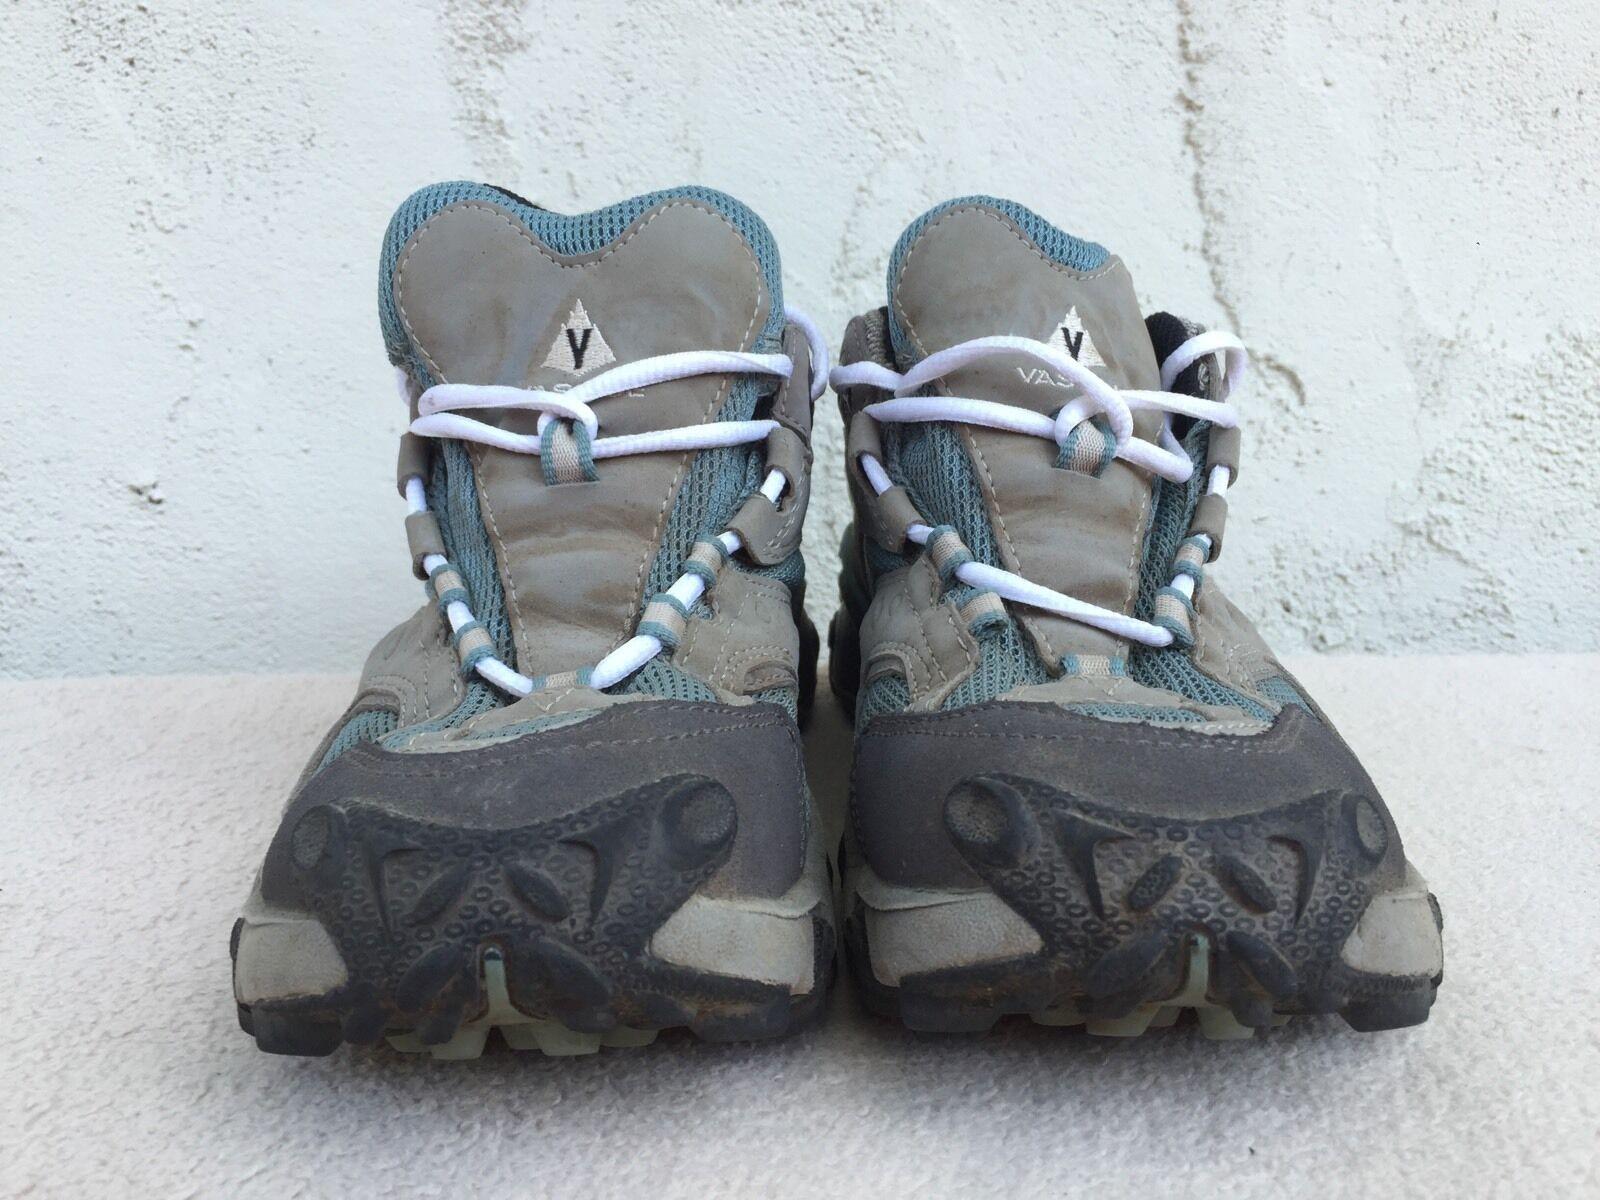 EUC Vasque Damenschuhe Trail Schuhe Sneaker Sneaker Sneaker Boot Running Hiking US 8.5 M EUR 39.5 92c594